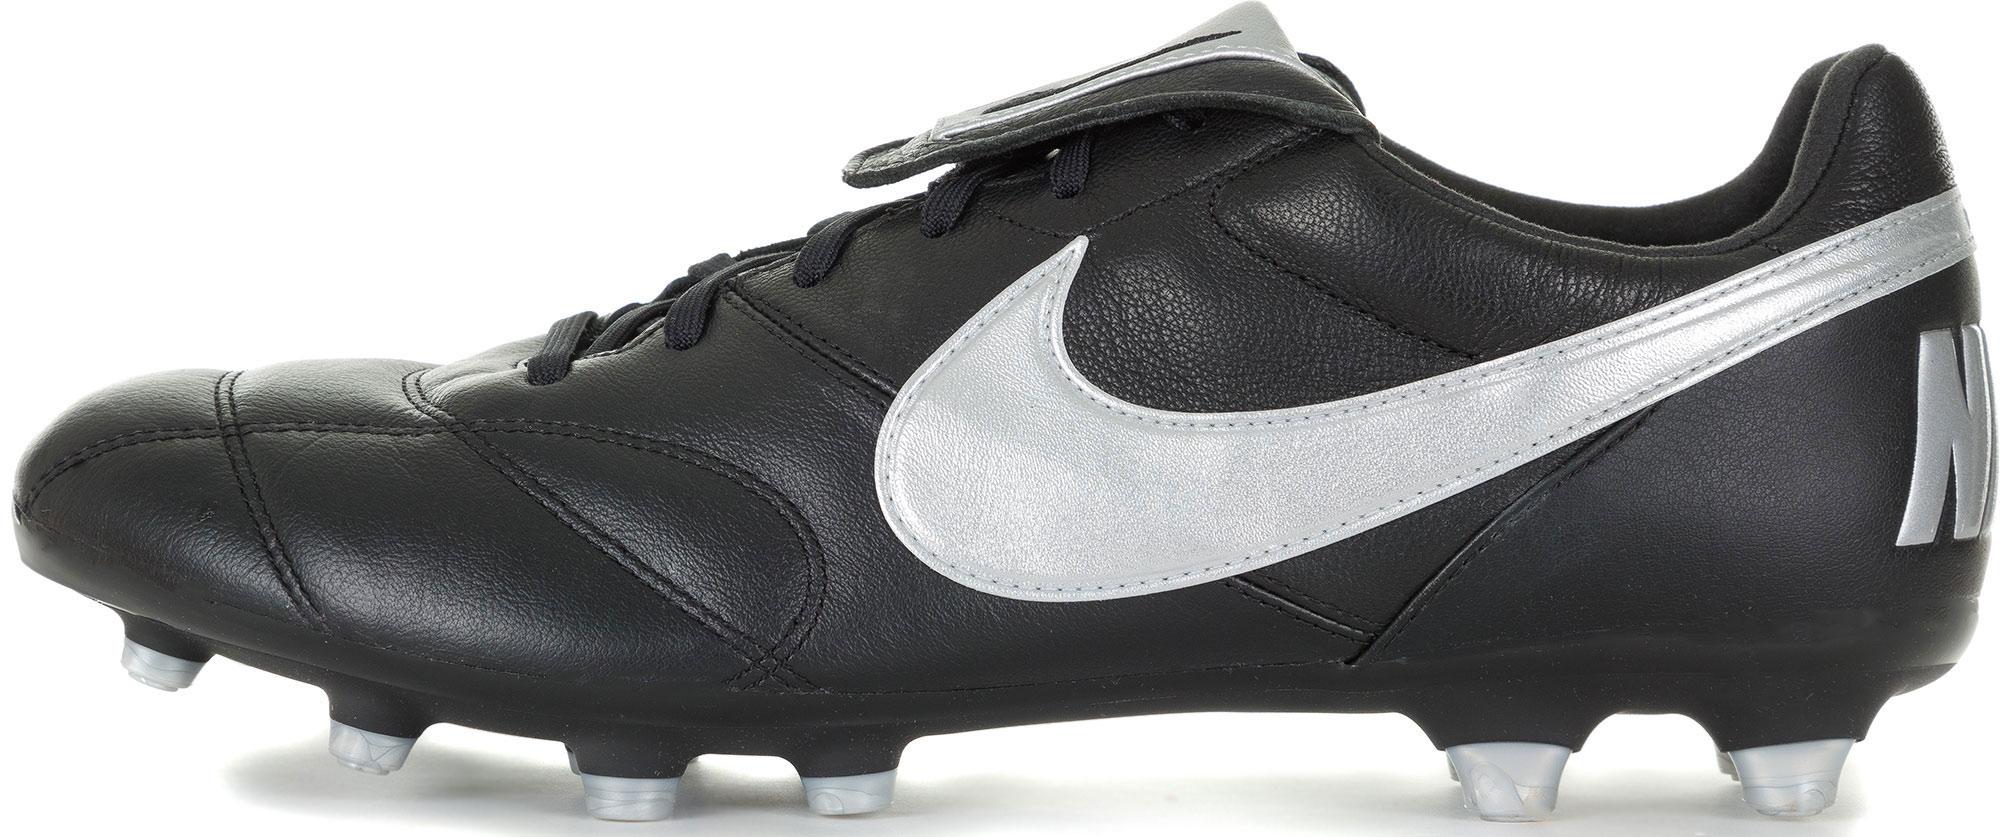 Nike Бутсы мужские Nike Premier II FG, размер 44